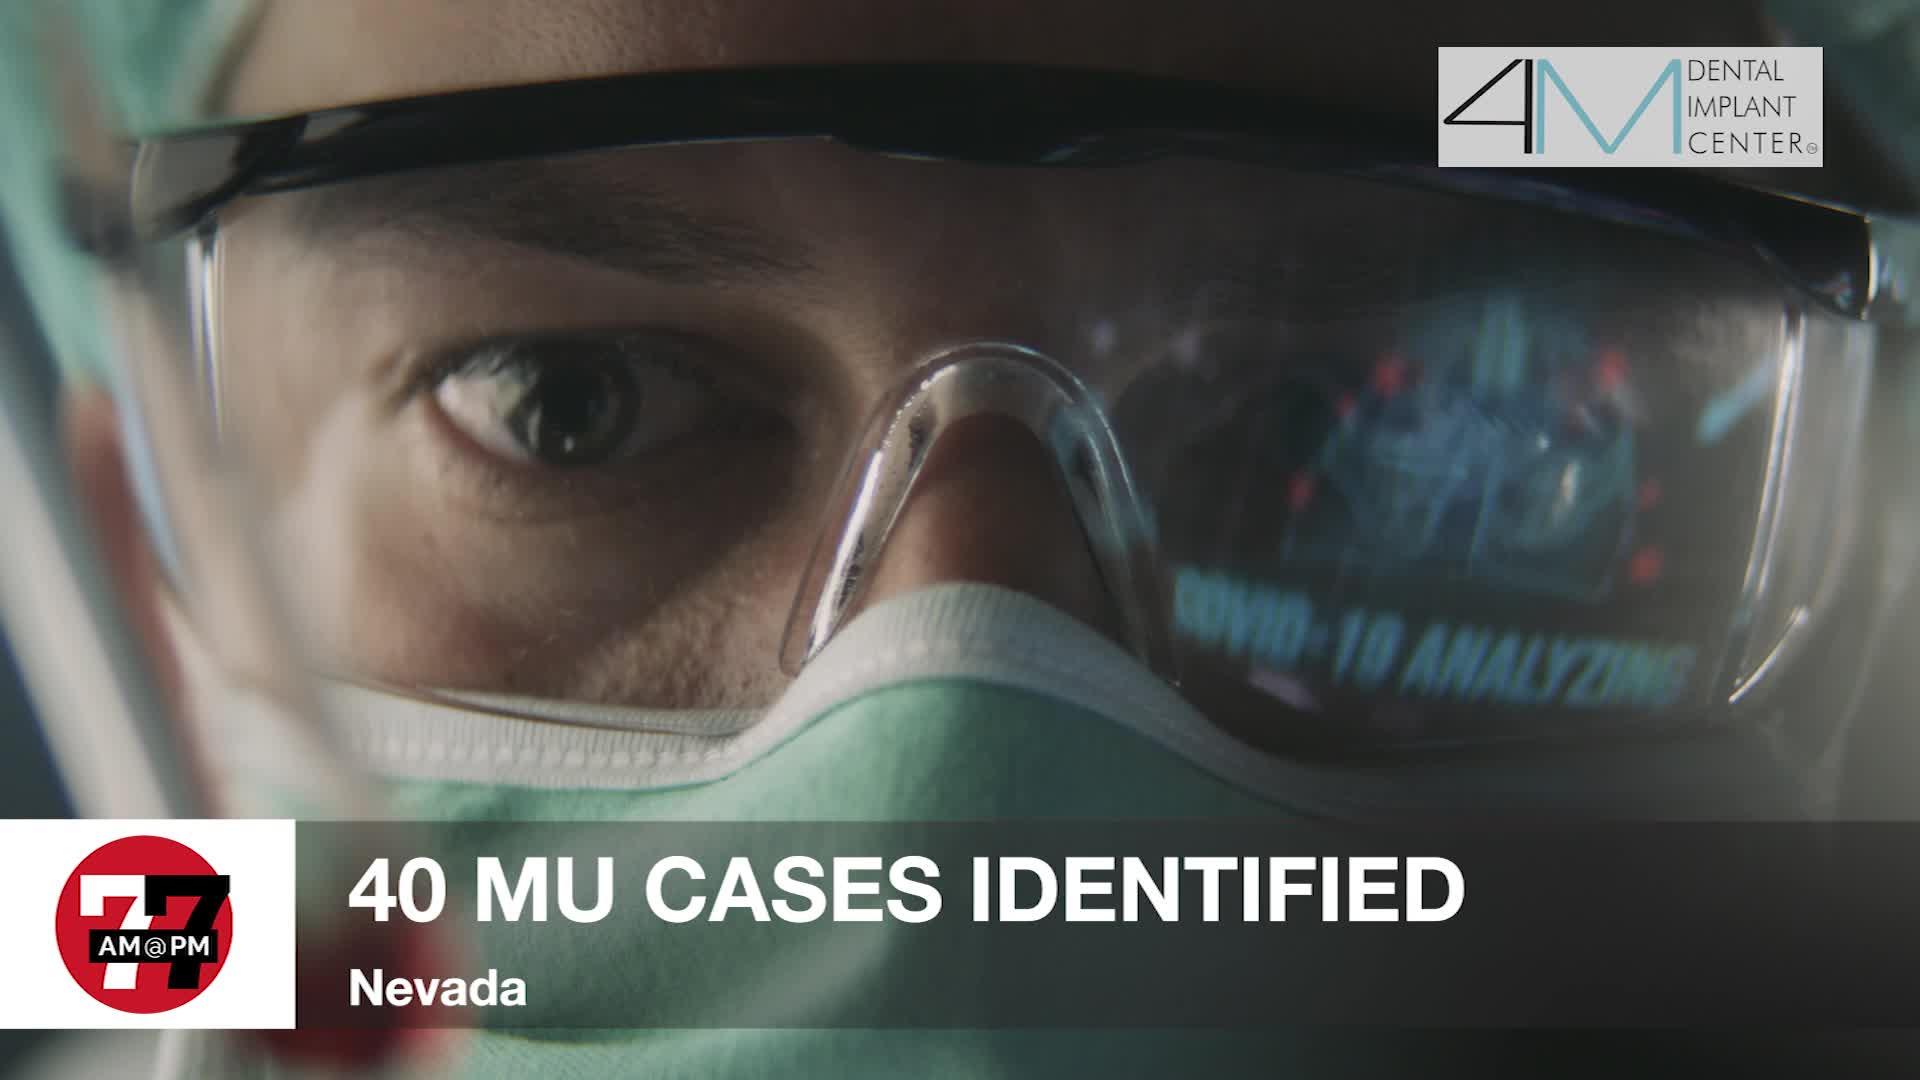 7@7PM 40 Mu Variant Cases